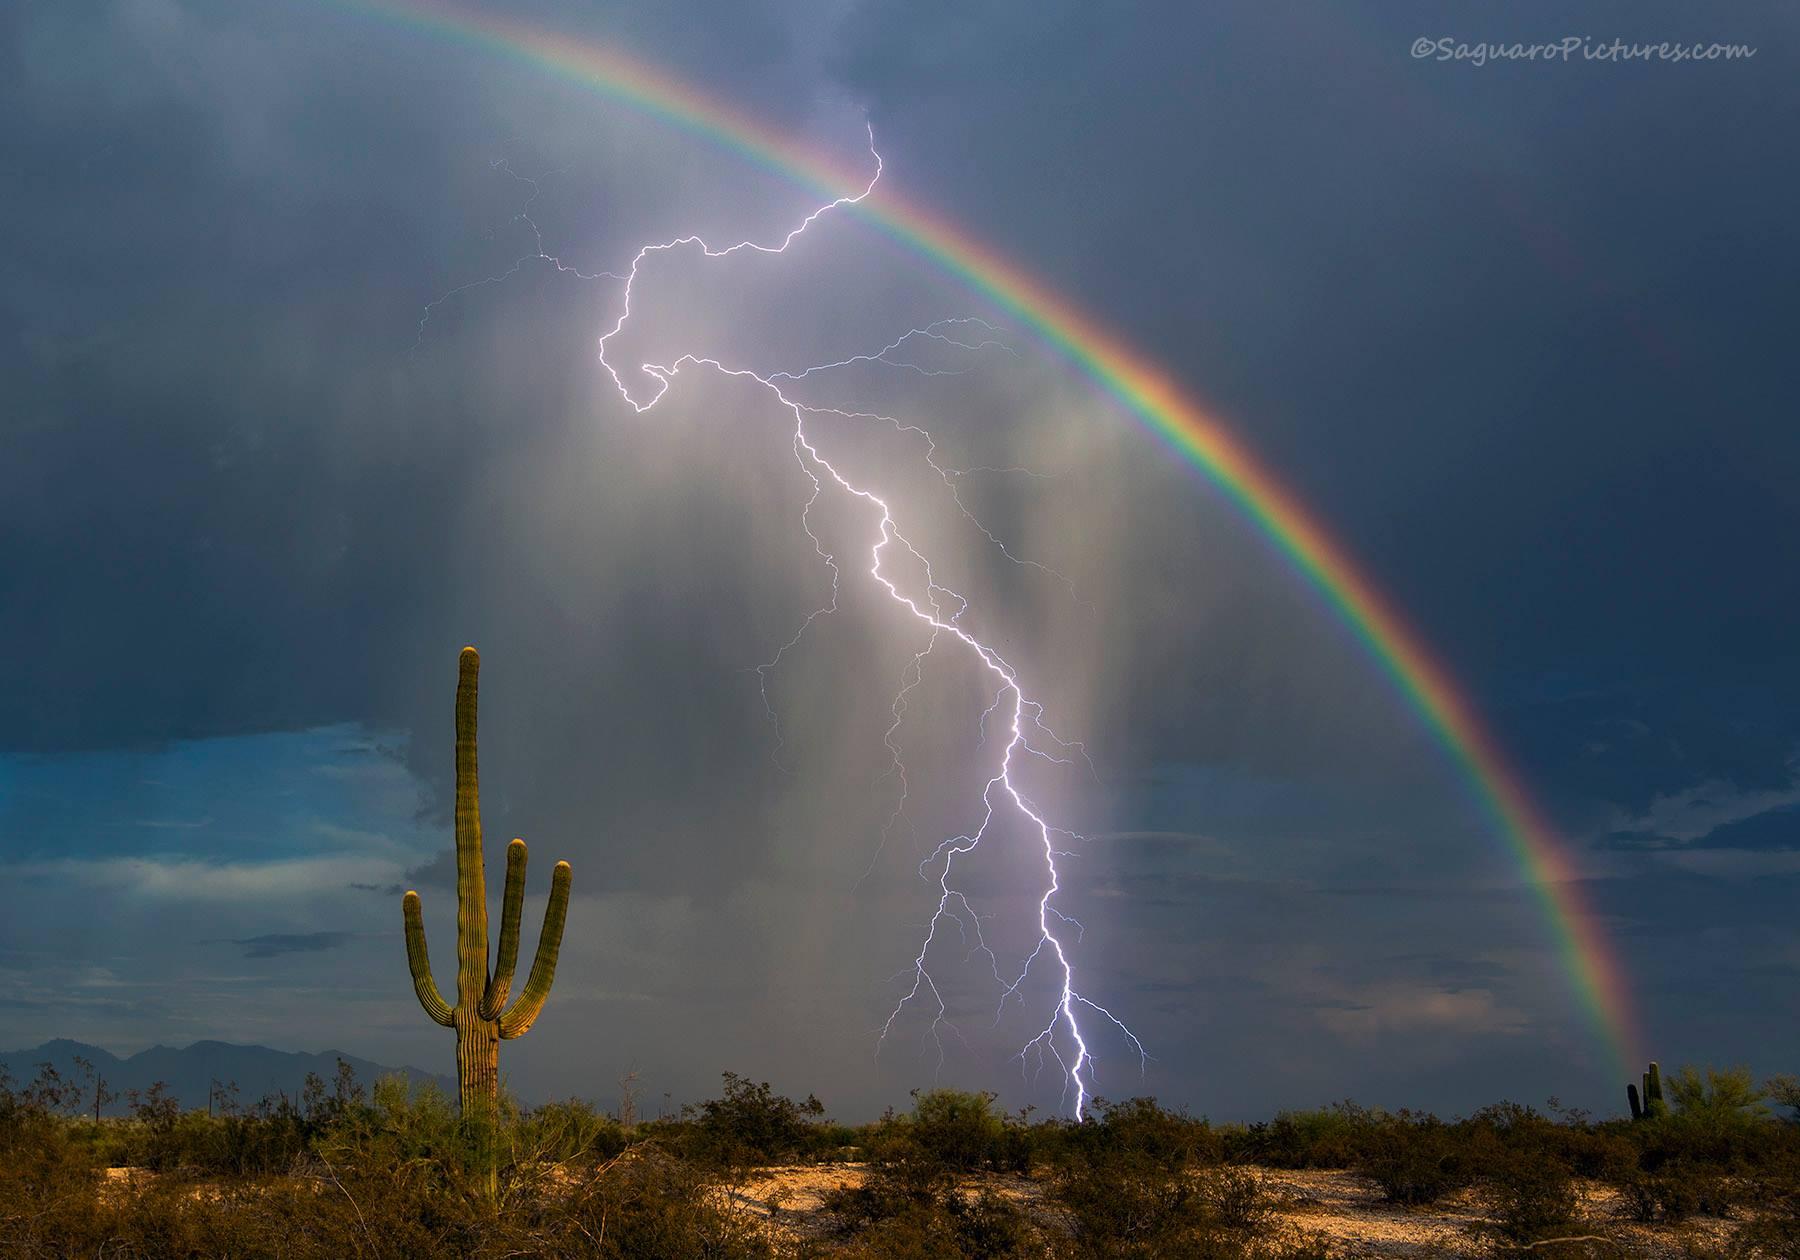 Lightning Bolt, Rainbow Captured in Dazzling Viral Photo